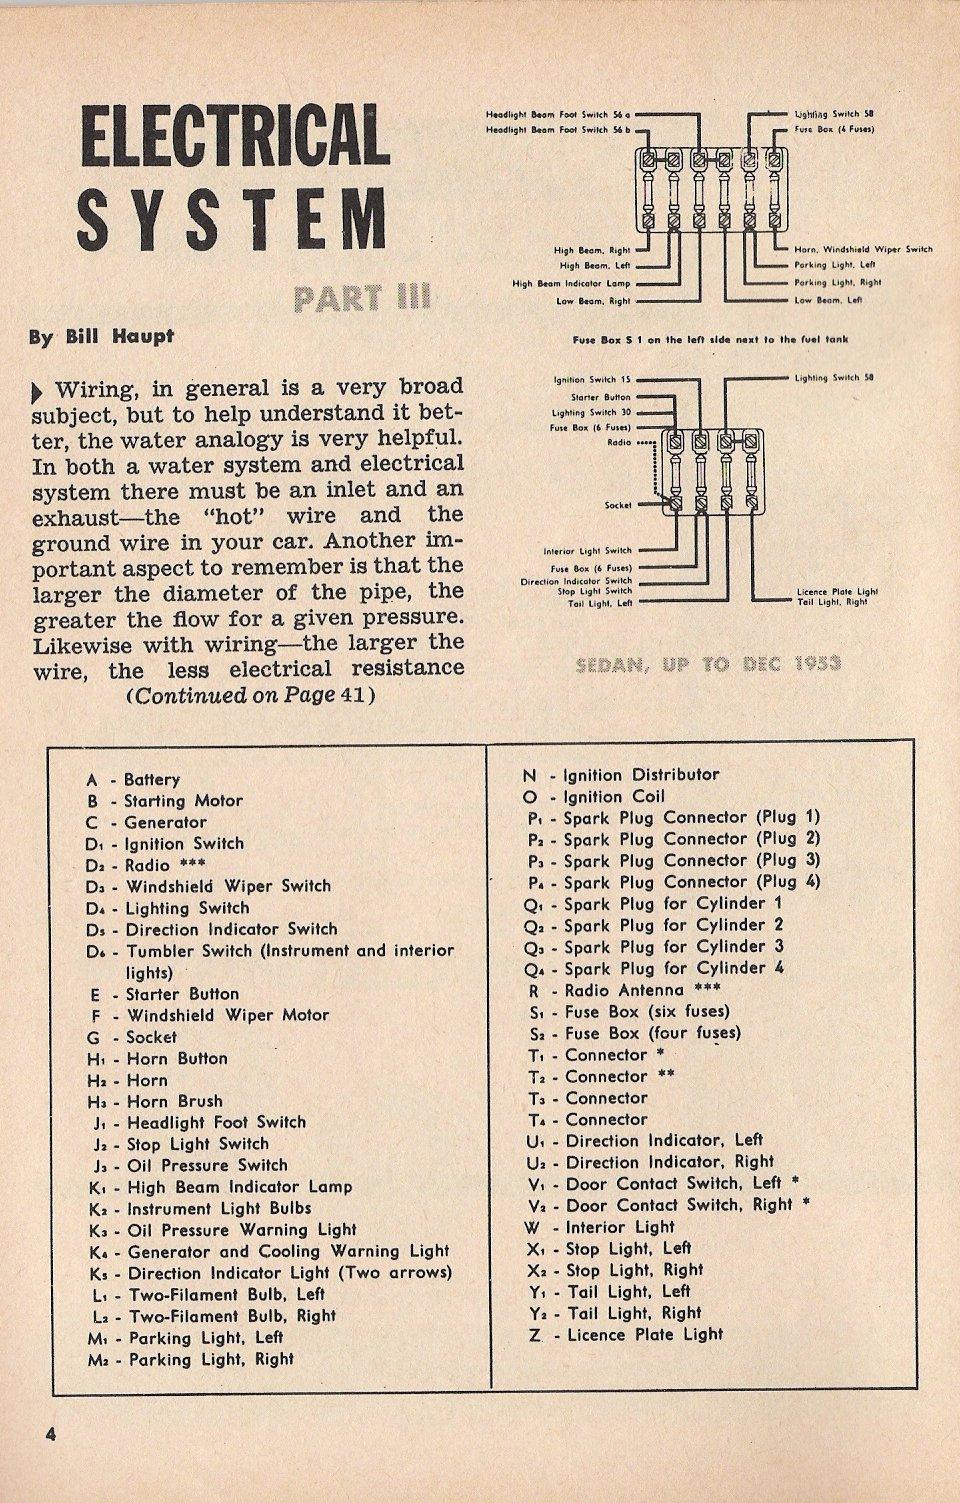 1952-53 Beetle Wiring Diagram | TheGoldenBug.com